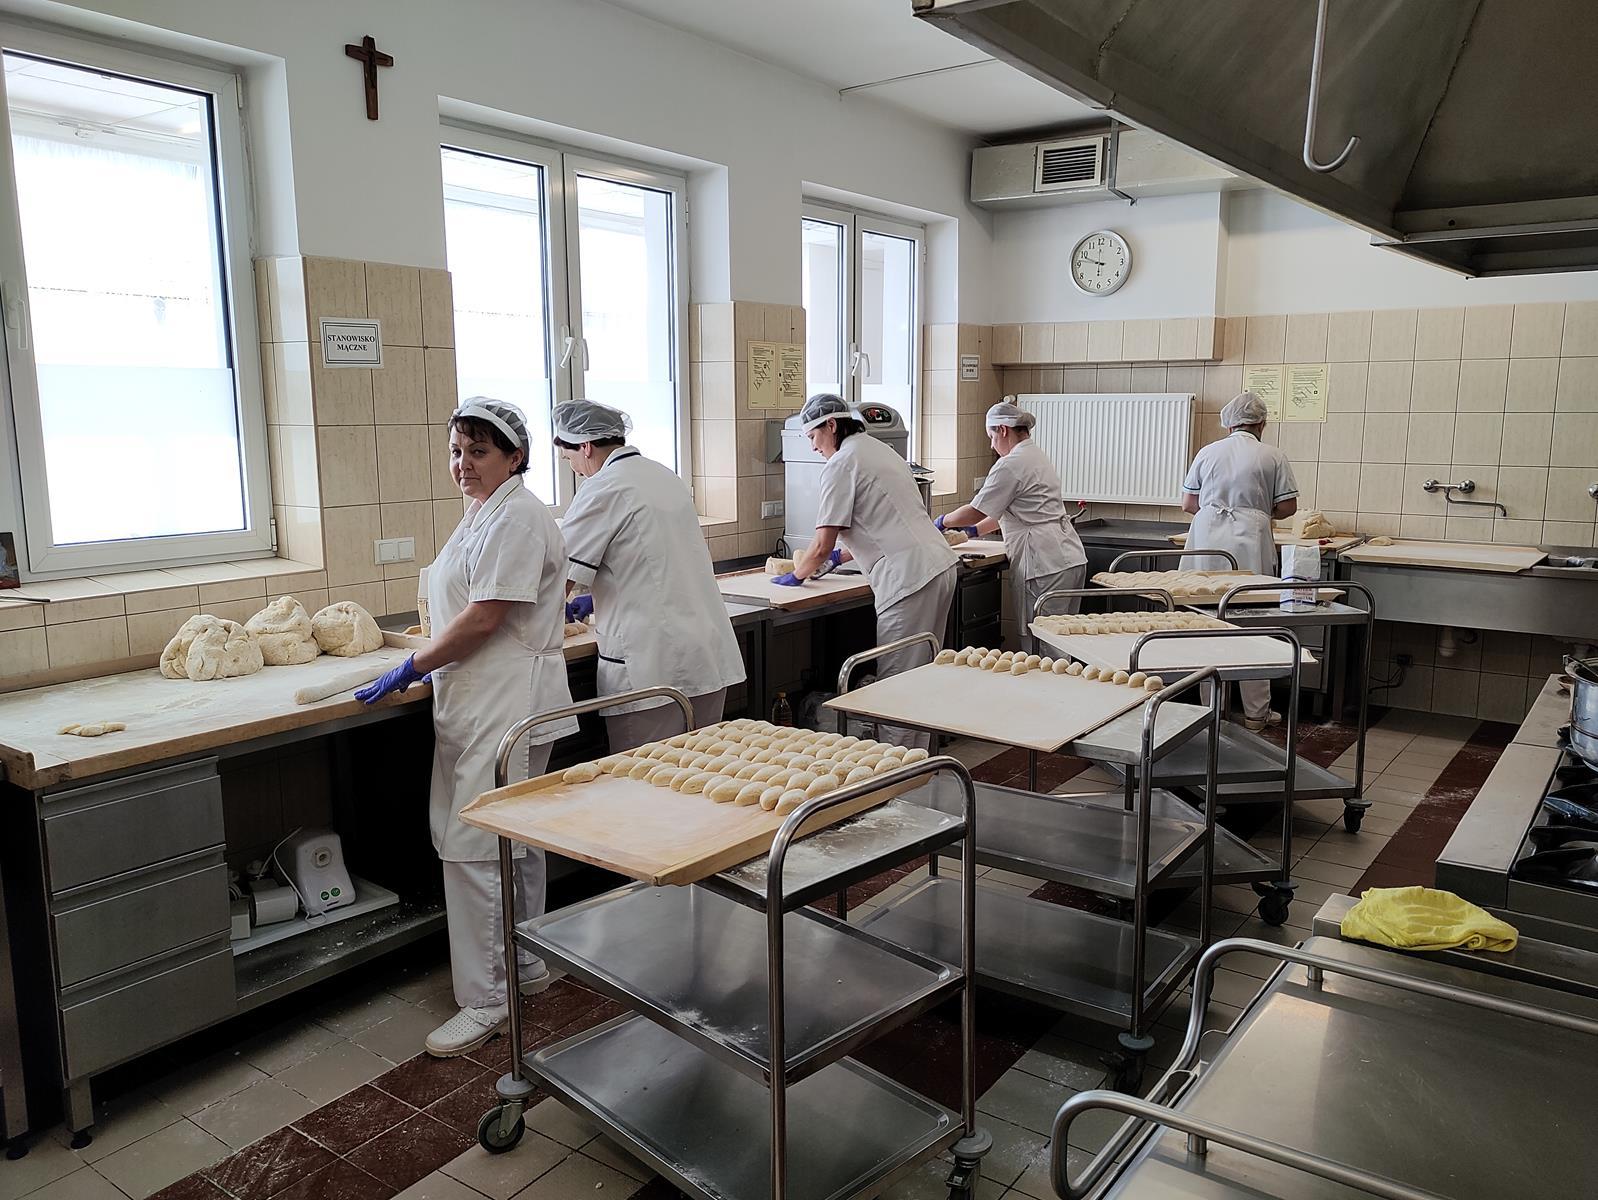 Kuchnia w DPS